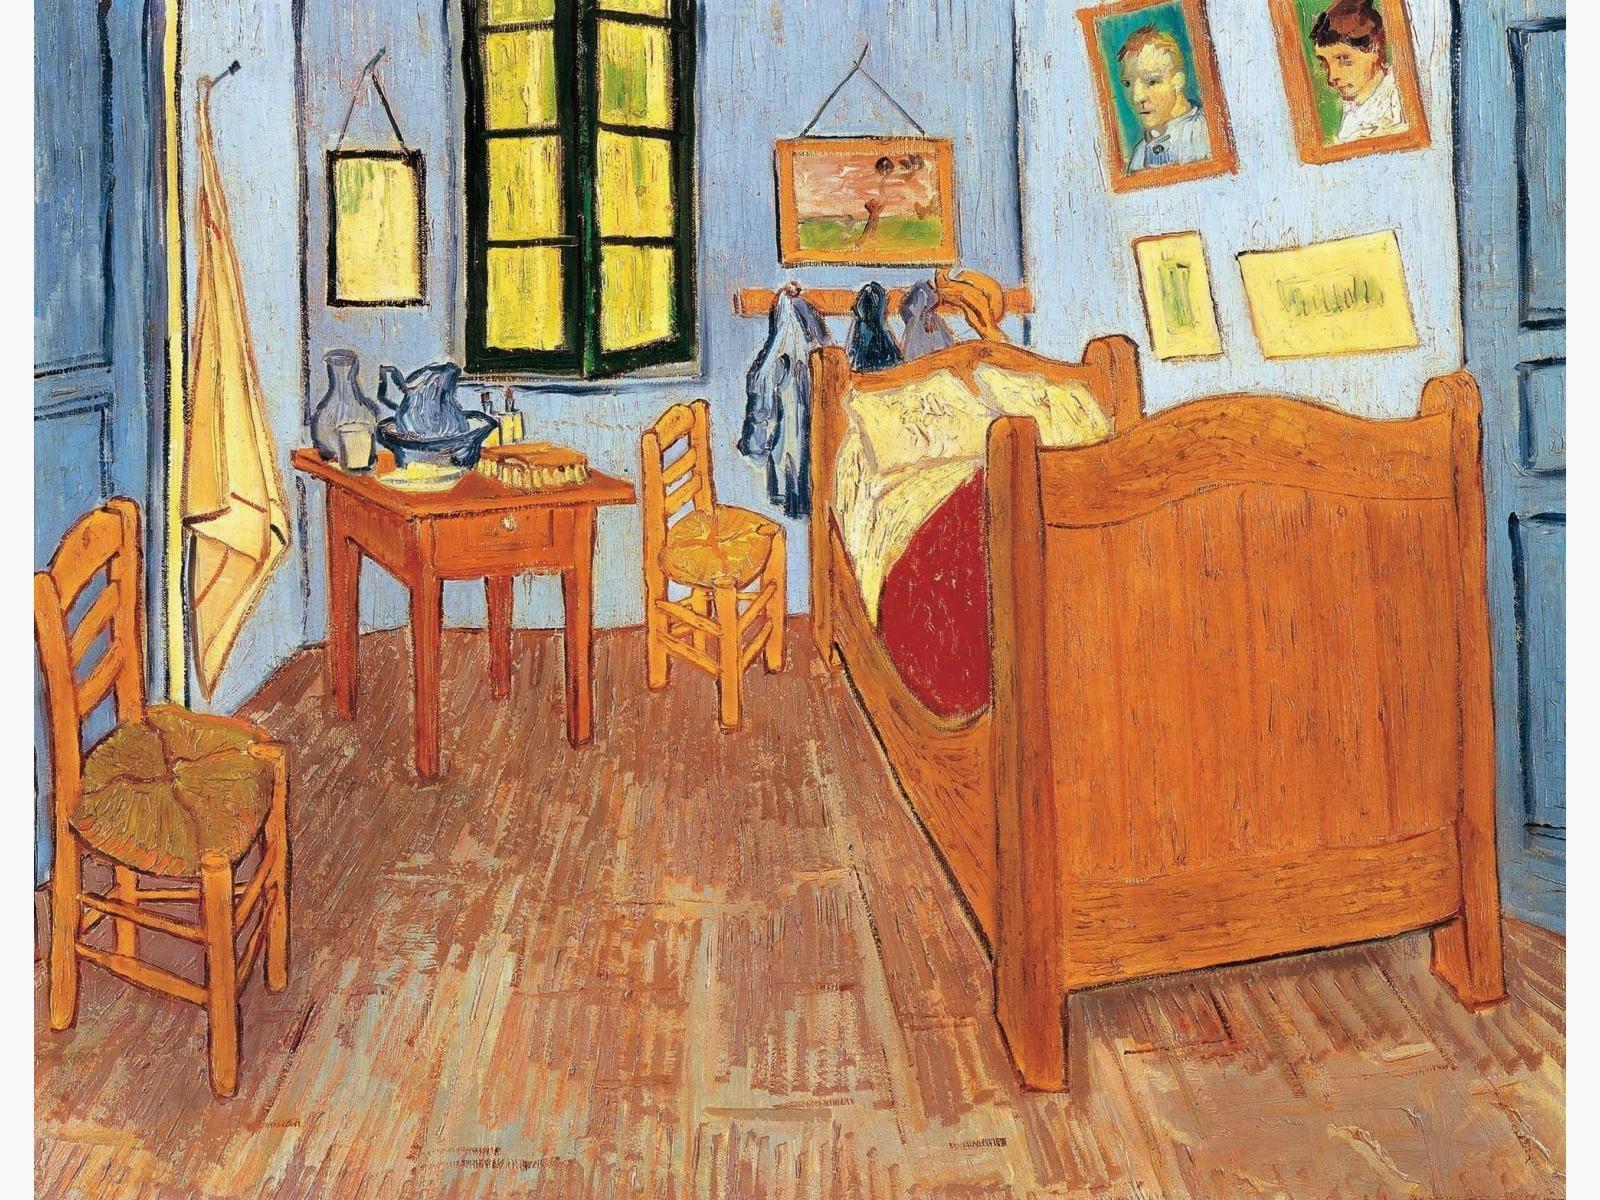 Le blabla blog de christine beigel la chambre de van gogh pirate des couleurs for La chambre jaune a arles van gogh